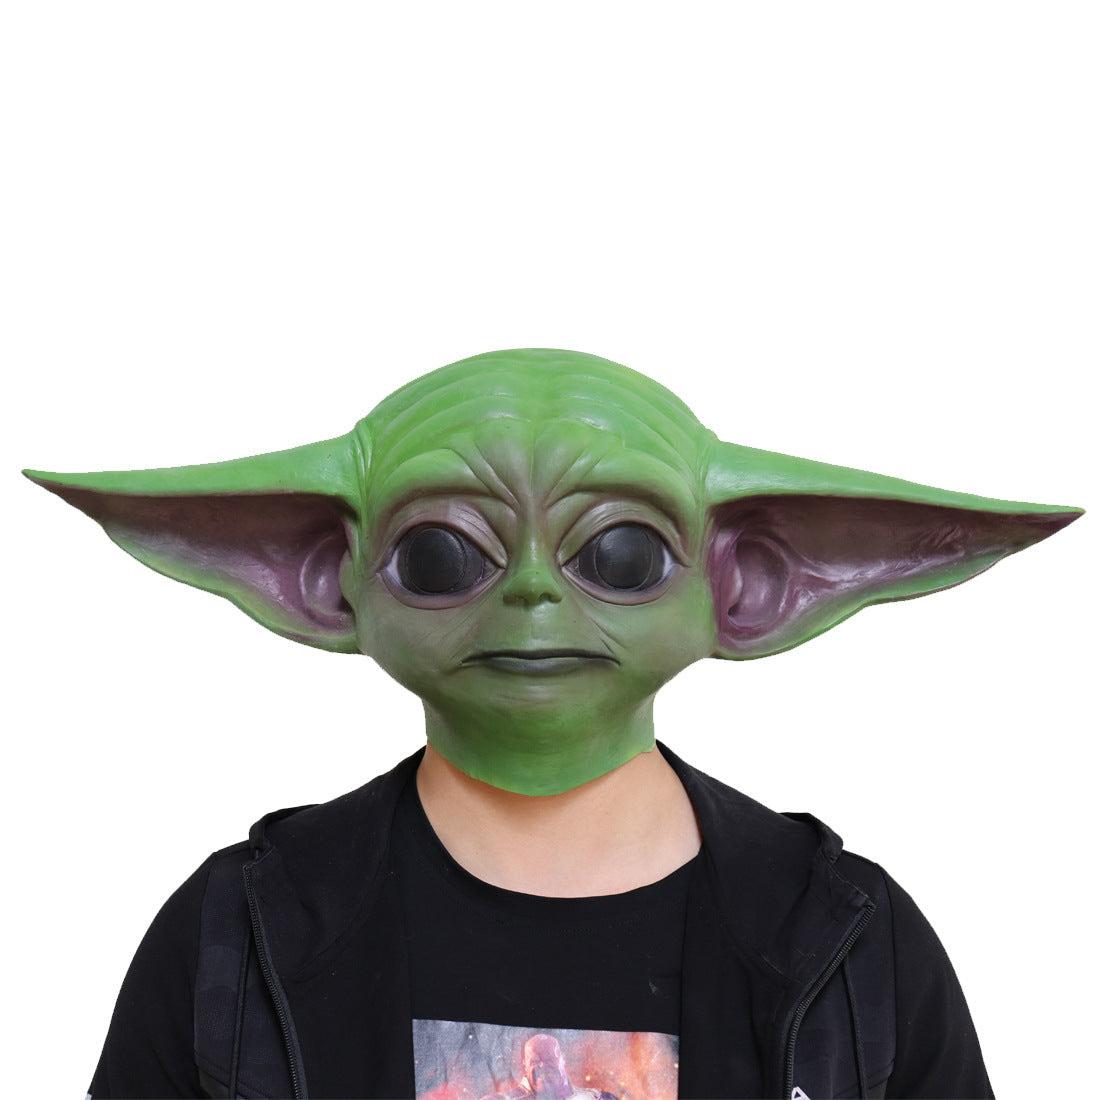 Star Wars Movie Yoda Jedi Master Latex Head Mask Cosplay Halloween Props Aliens